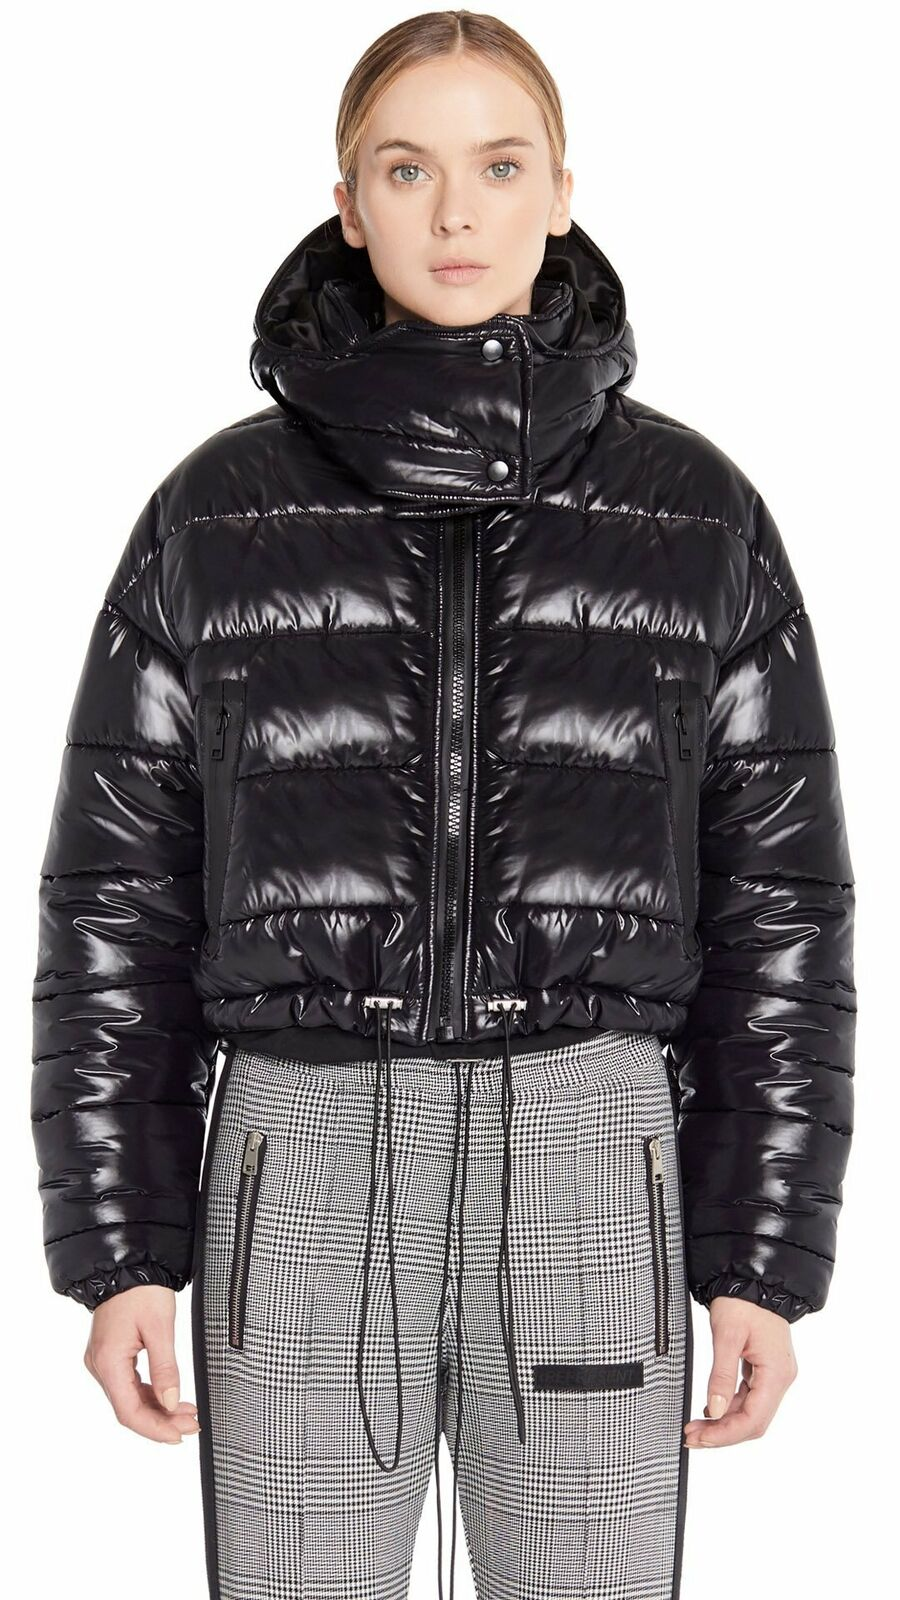 REPRESENT Women's Cropped Bubble Jacket - Shinny Black